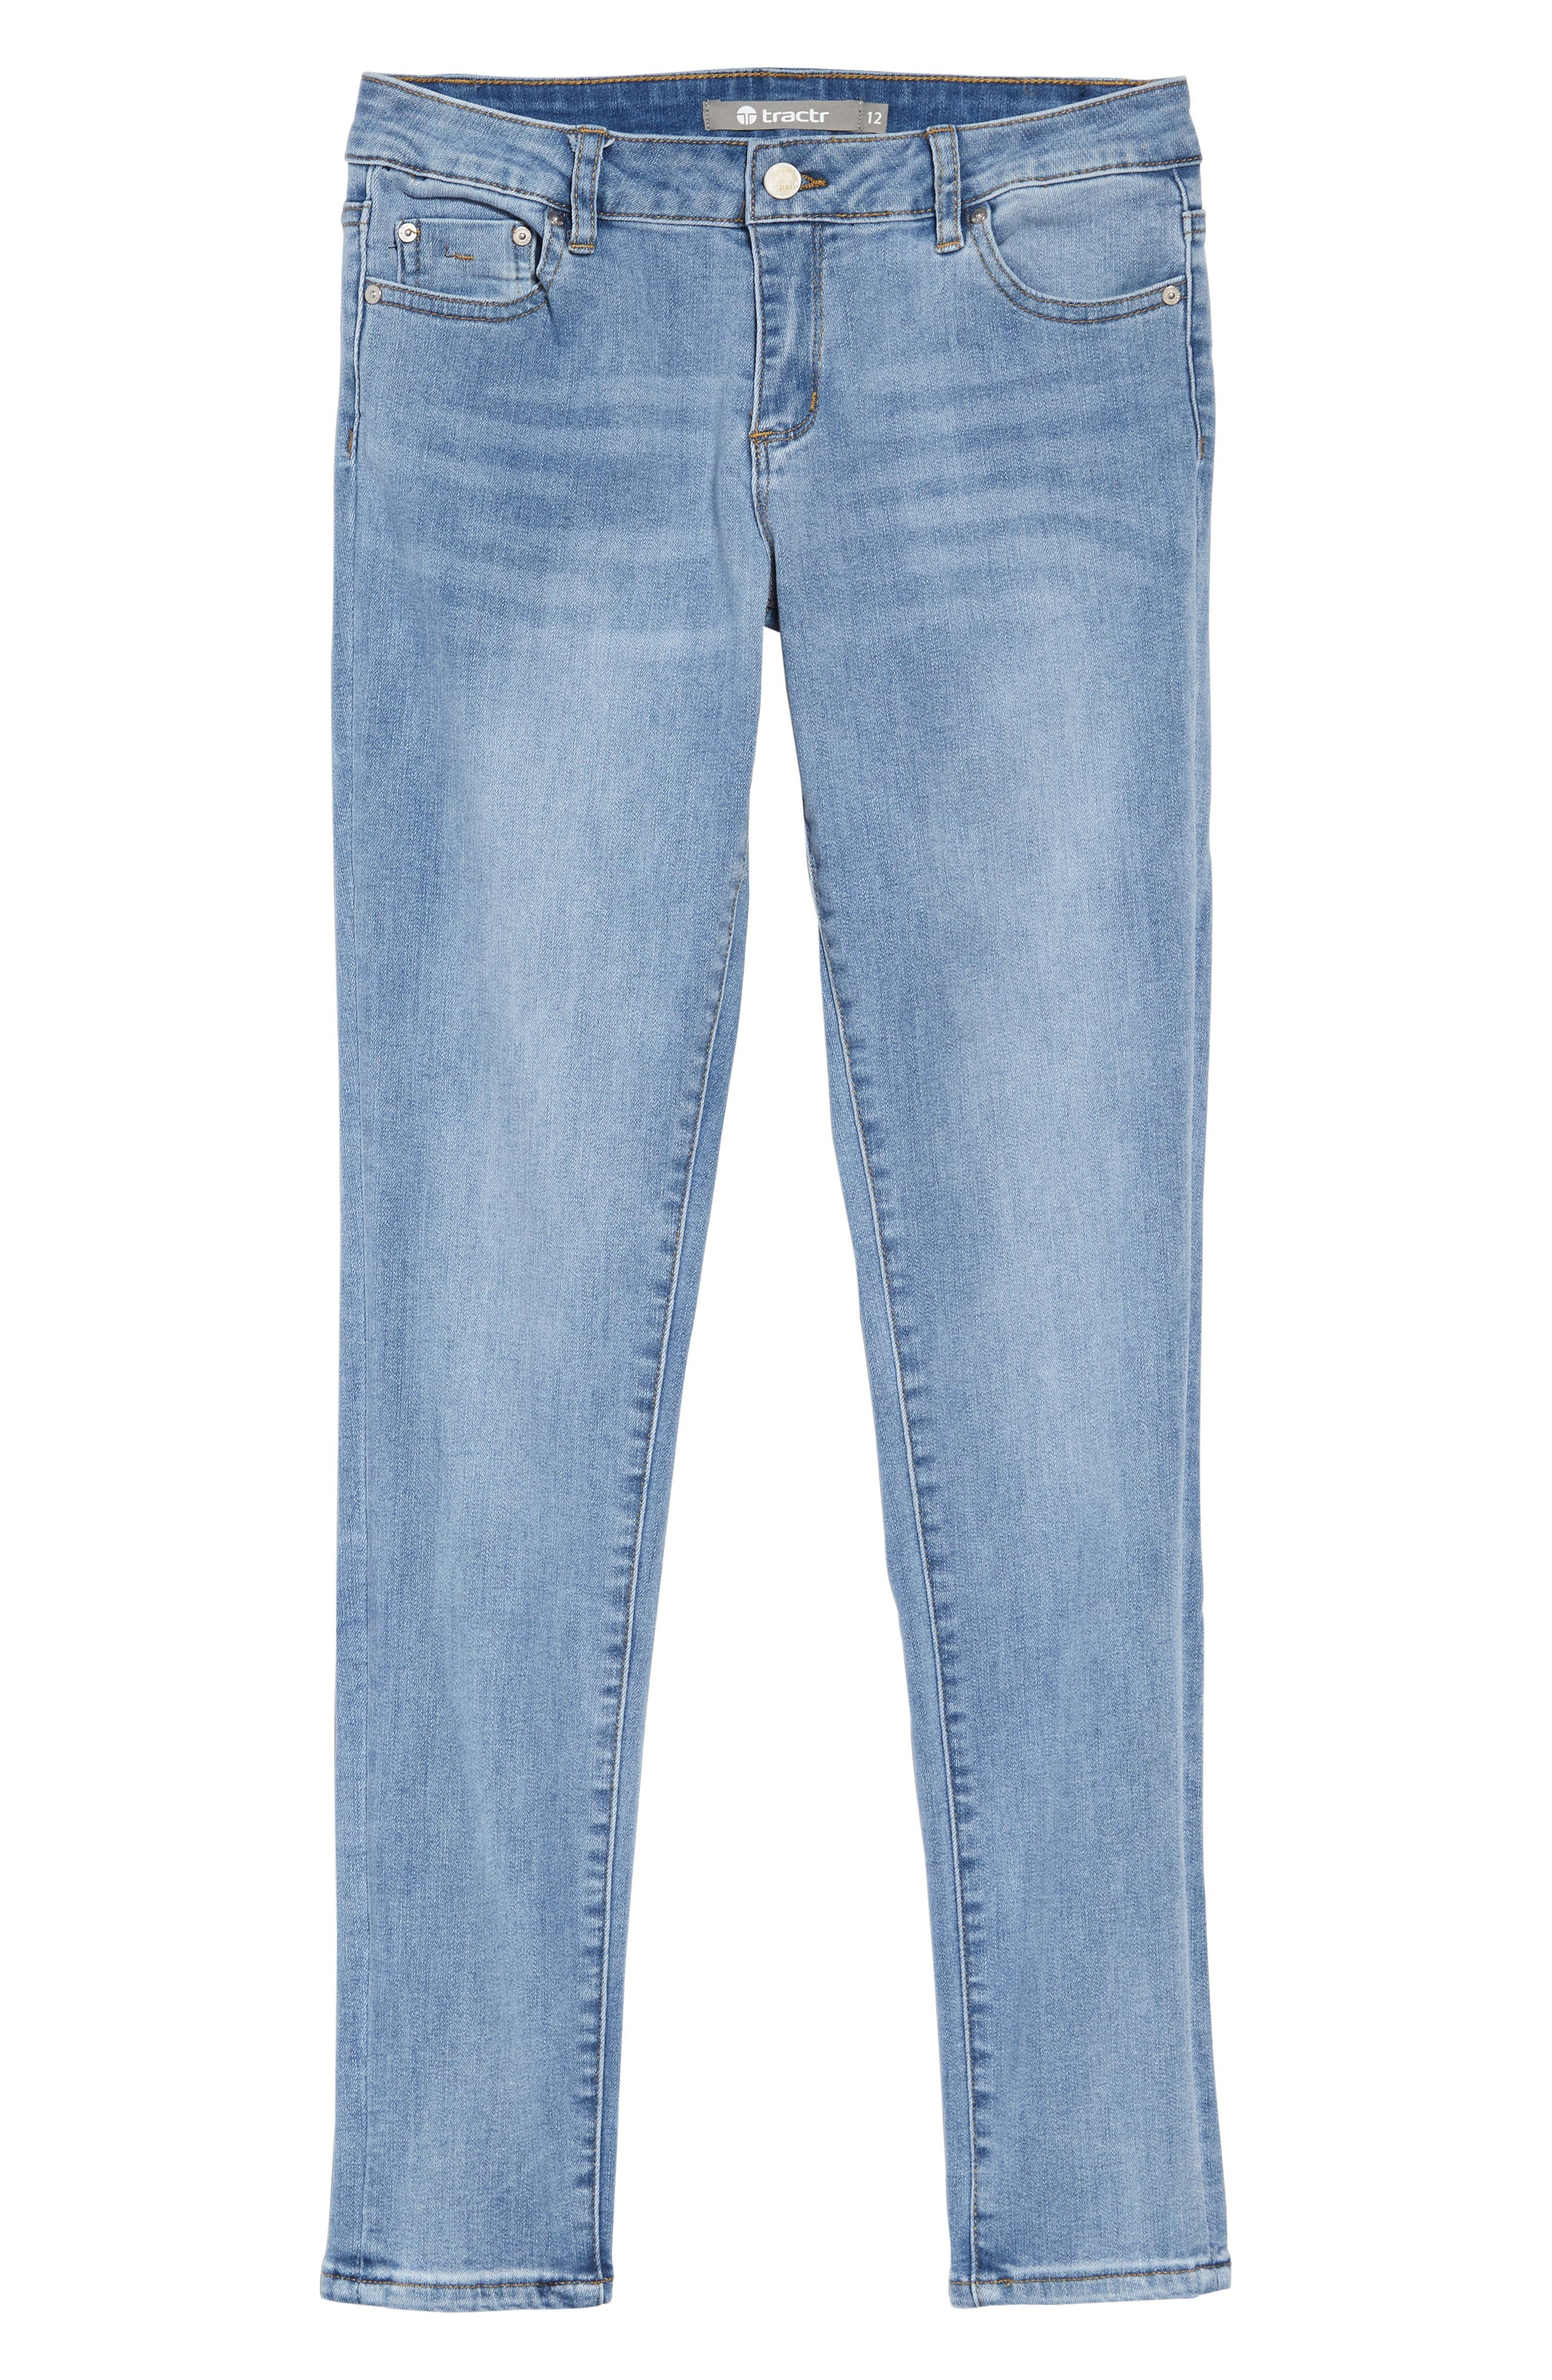 TRACTR, Diane Skinny Jeans, Main thumbnail 1, color, LIGHT INDIGO